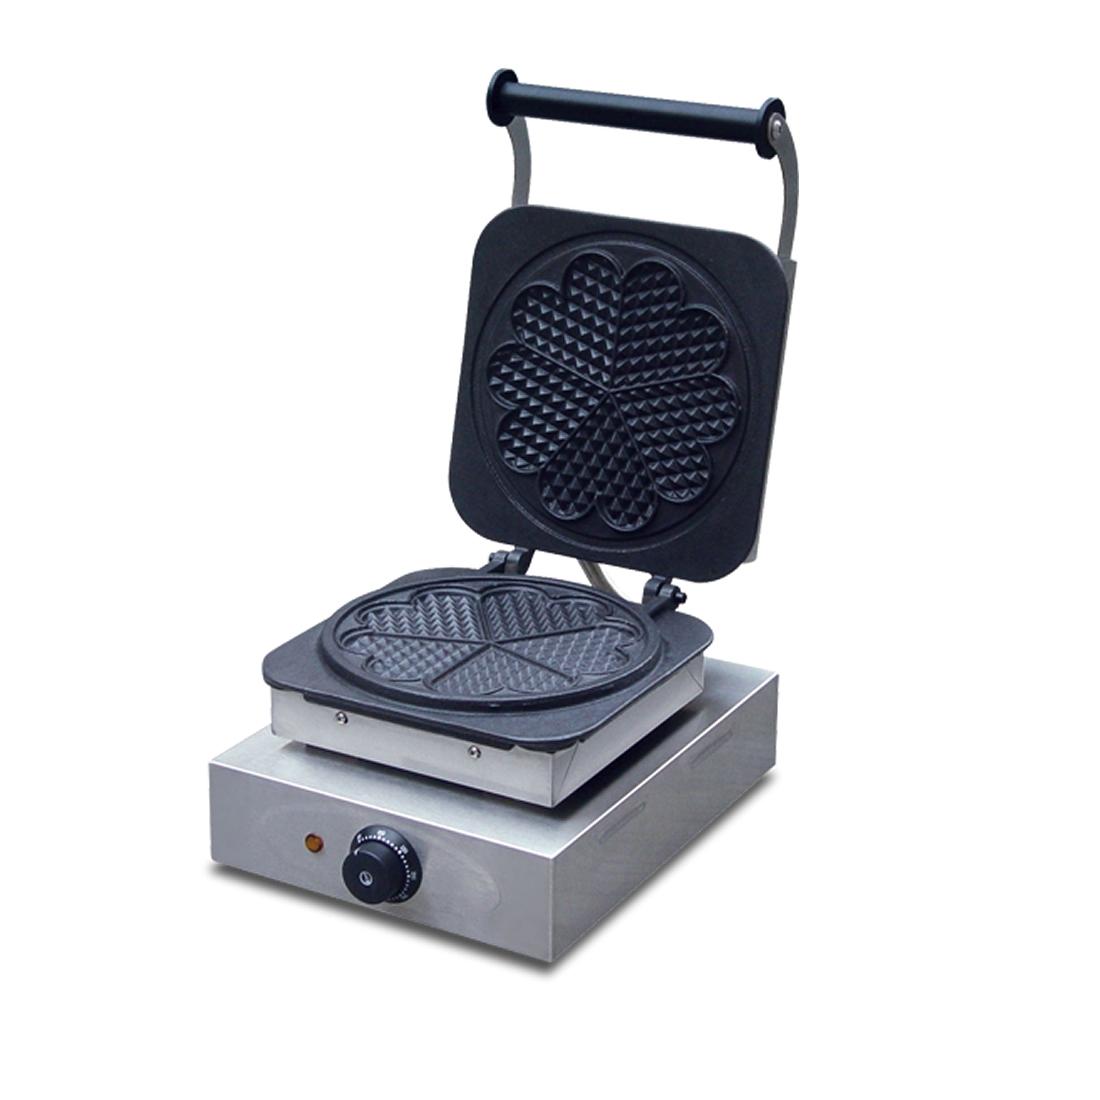 Electric waffle Maker - UWB-H